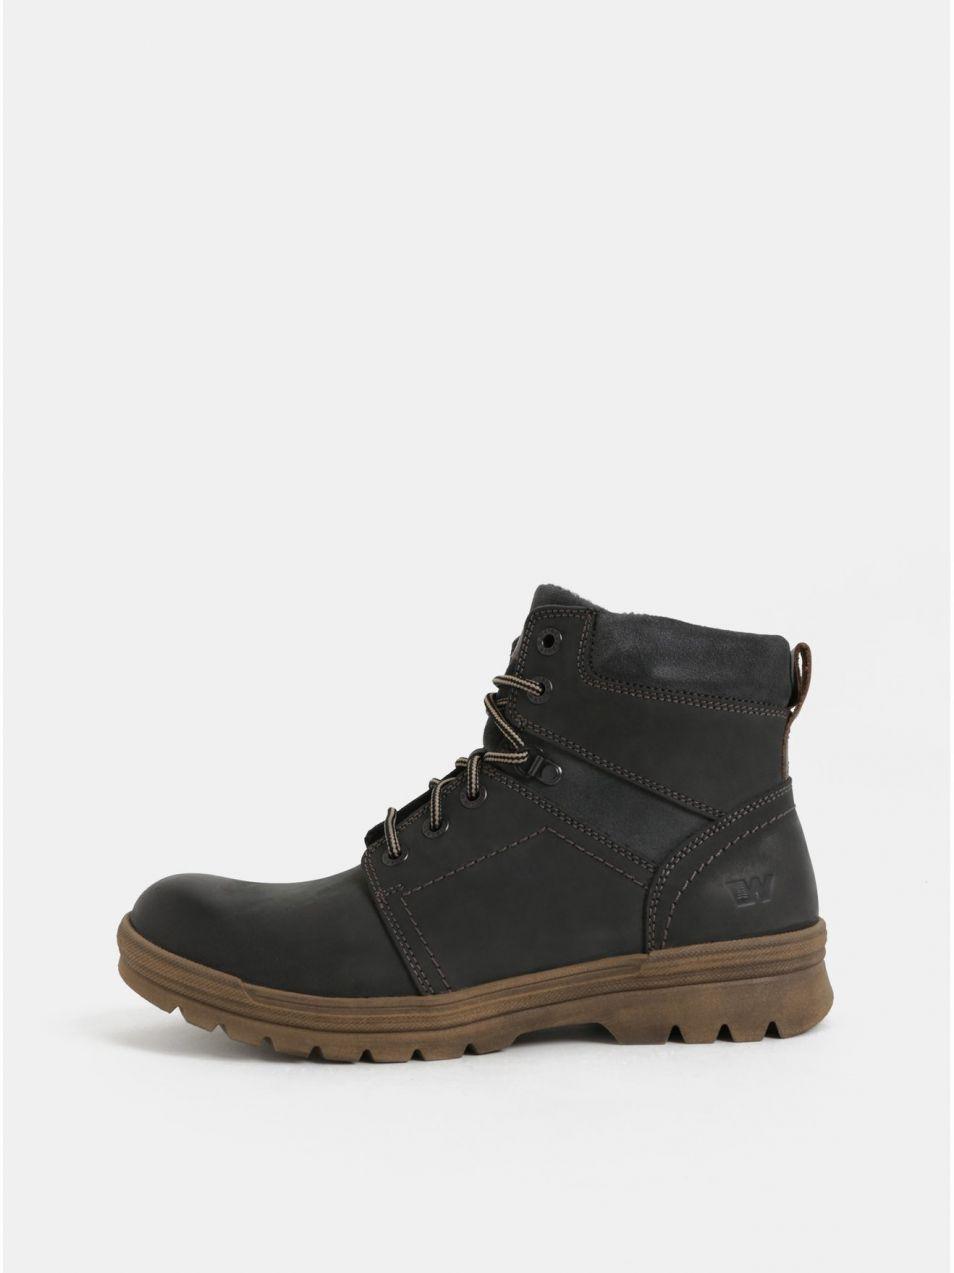 cc90aac8ee0a Tmavosivé pánske kožené členkové zimné topánky so semišovými detailmi  Weinbrenner značky Weinbrenner - Lovely.sk